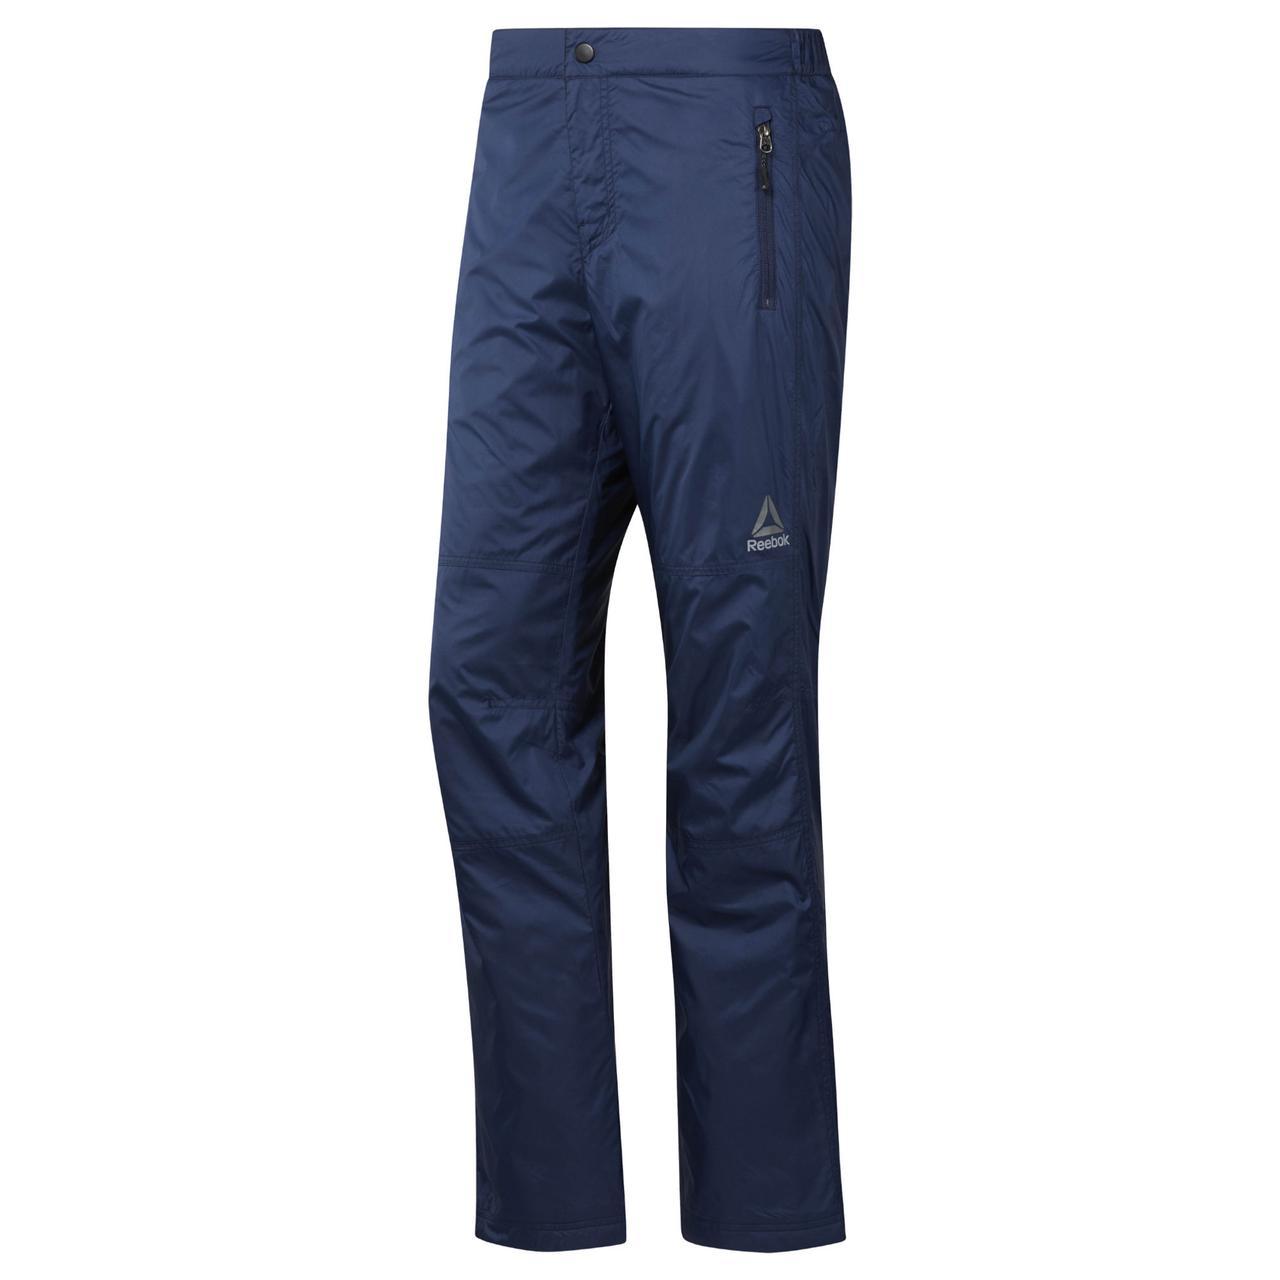 Мужские брюки Reebok Outdoor Fleece Lined (Артикул: D78622)